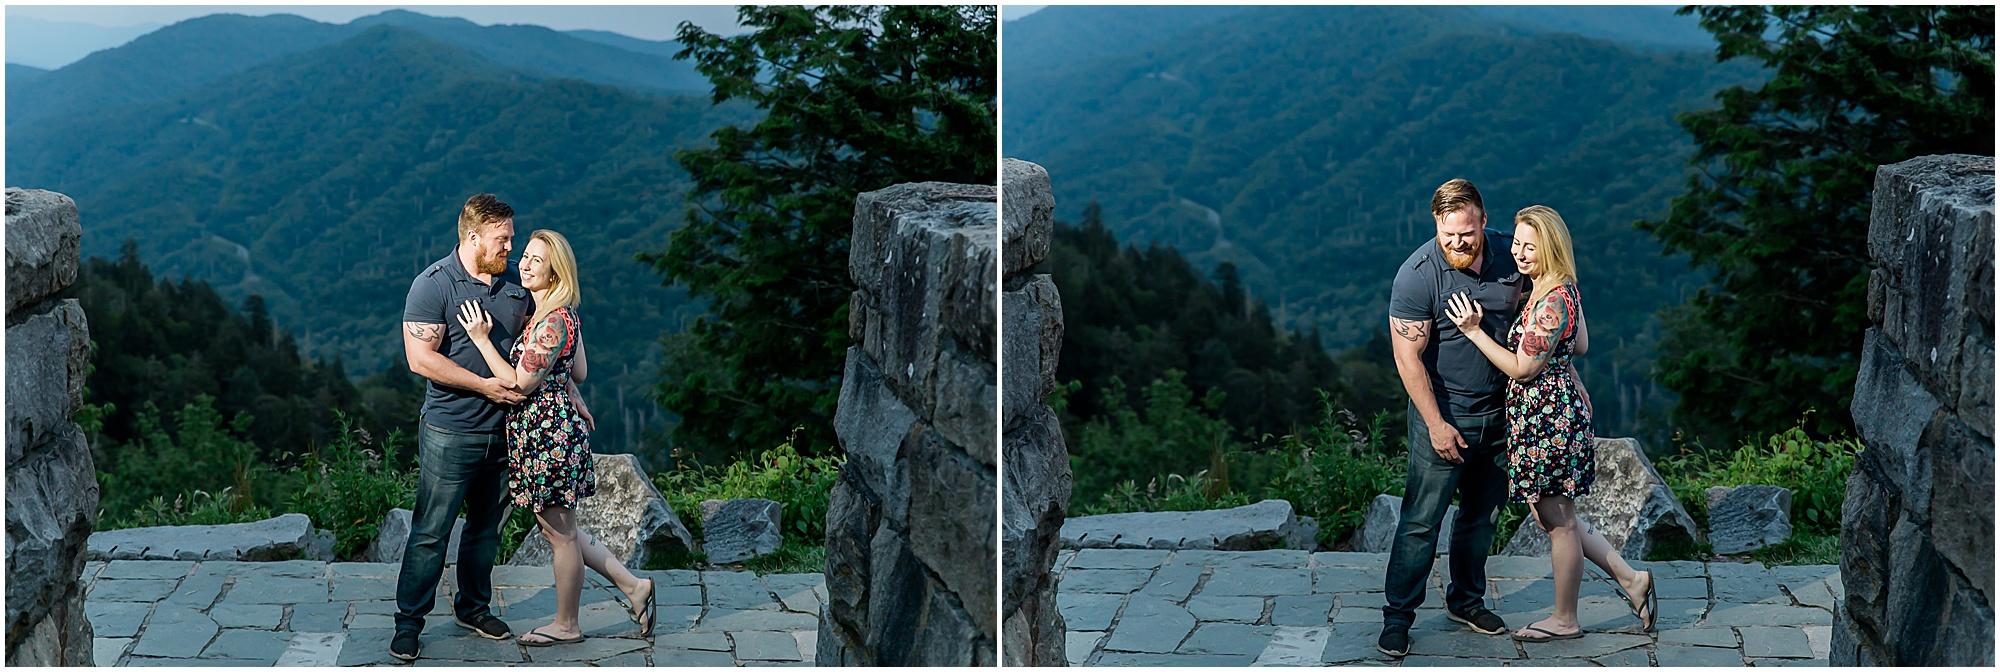 surprise proposal gatlinburg tennessee mountain engagement hiking new adventure productions_0136.jpg